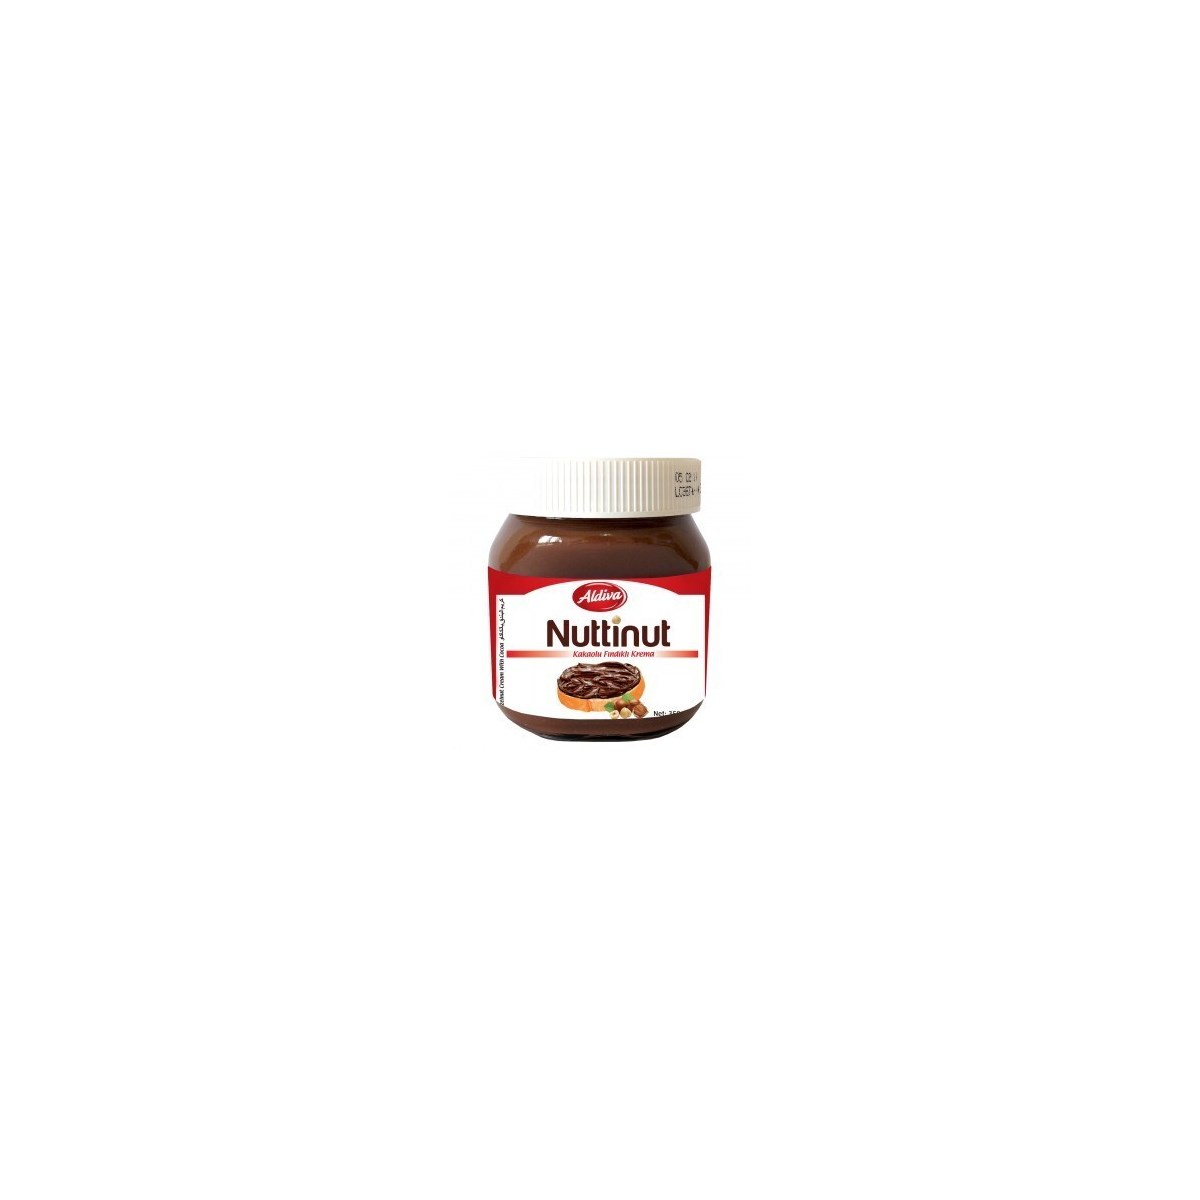 NUTTINUT CREAM CHOCOLATE GLASS 350 GR X 12